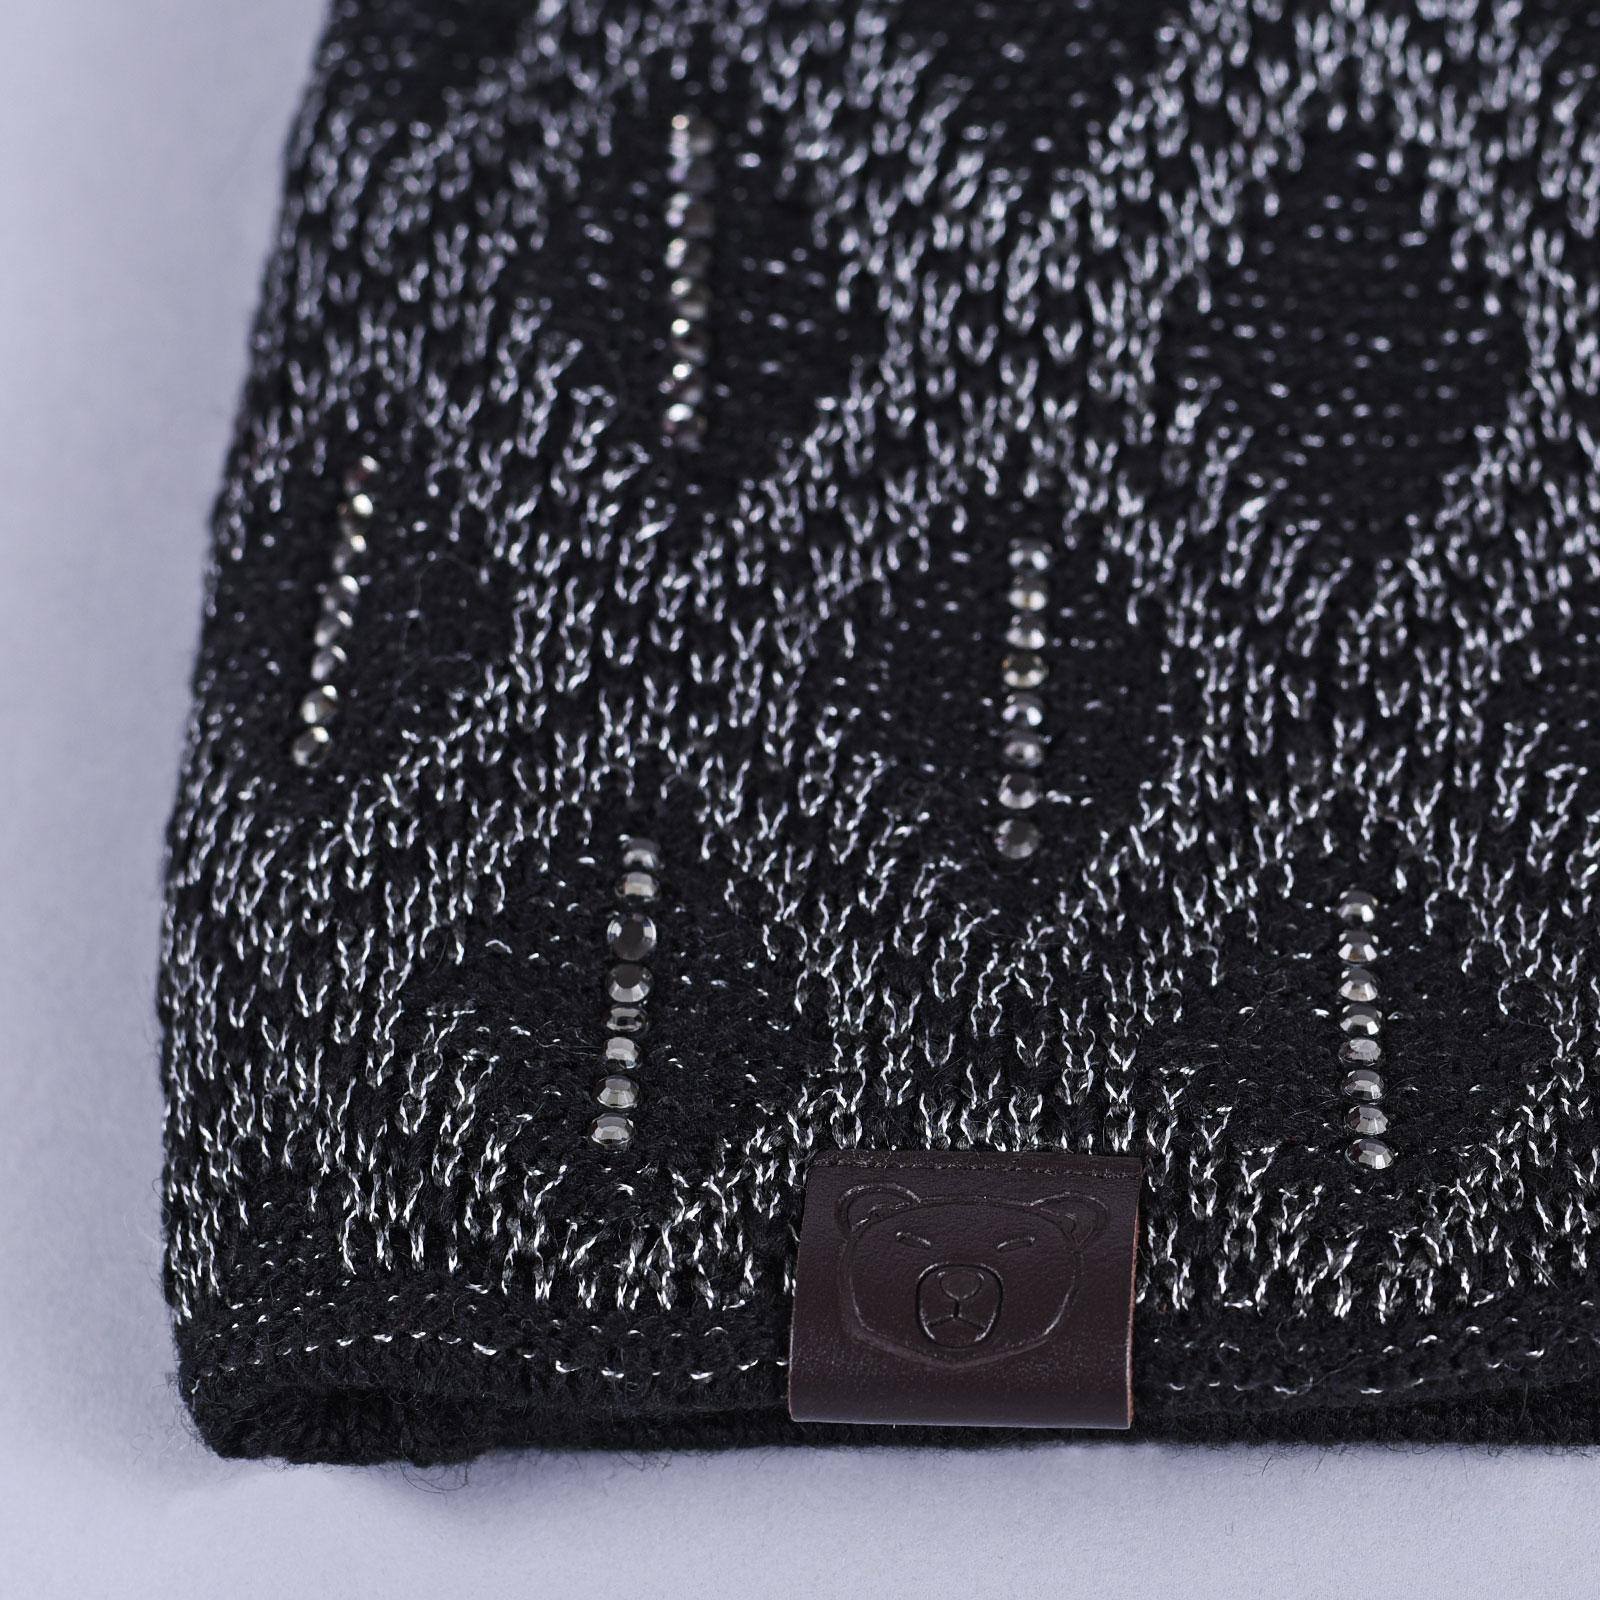 CP-01044-D16-1-bonnet-femme-noir